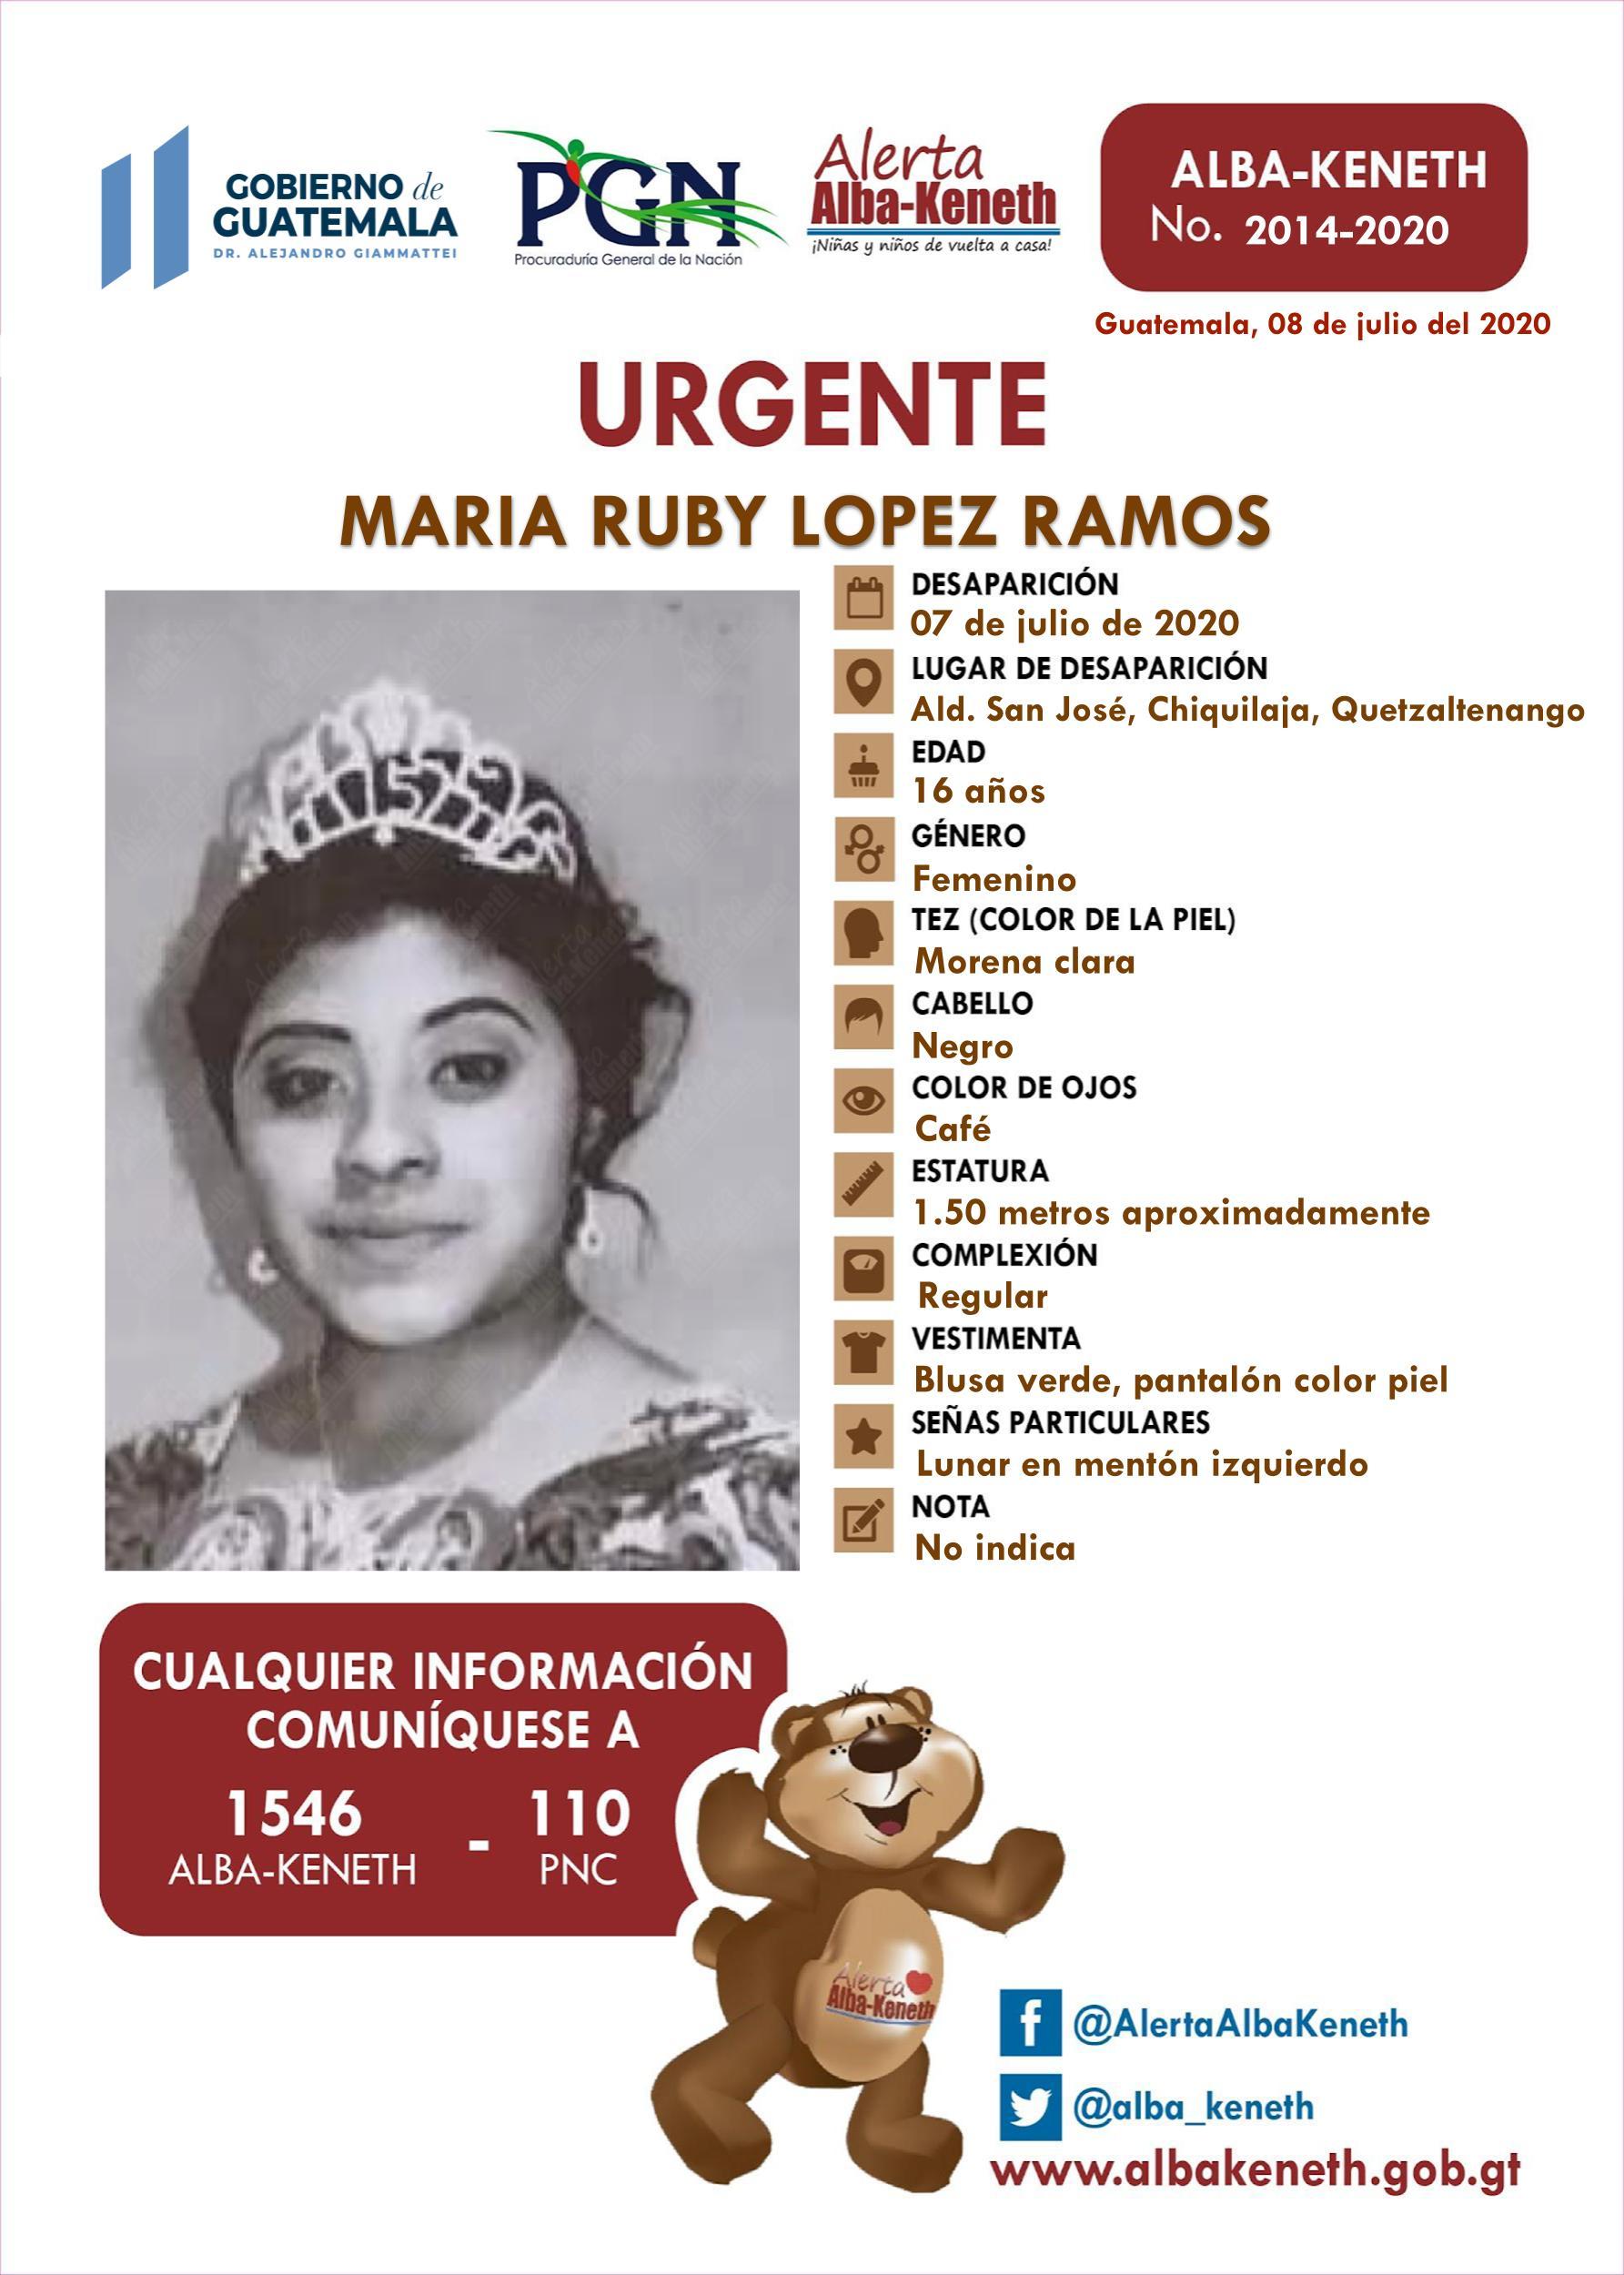 Maria Ruby Lopez Ramos